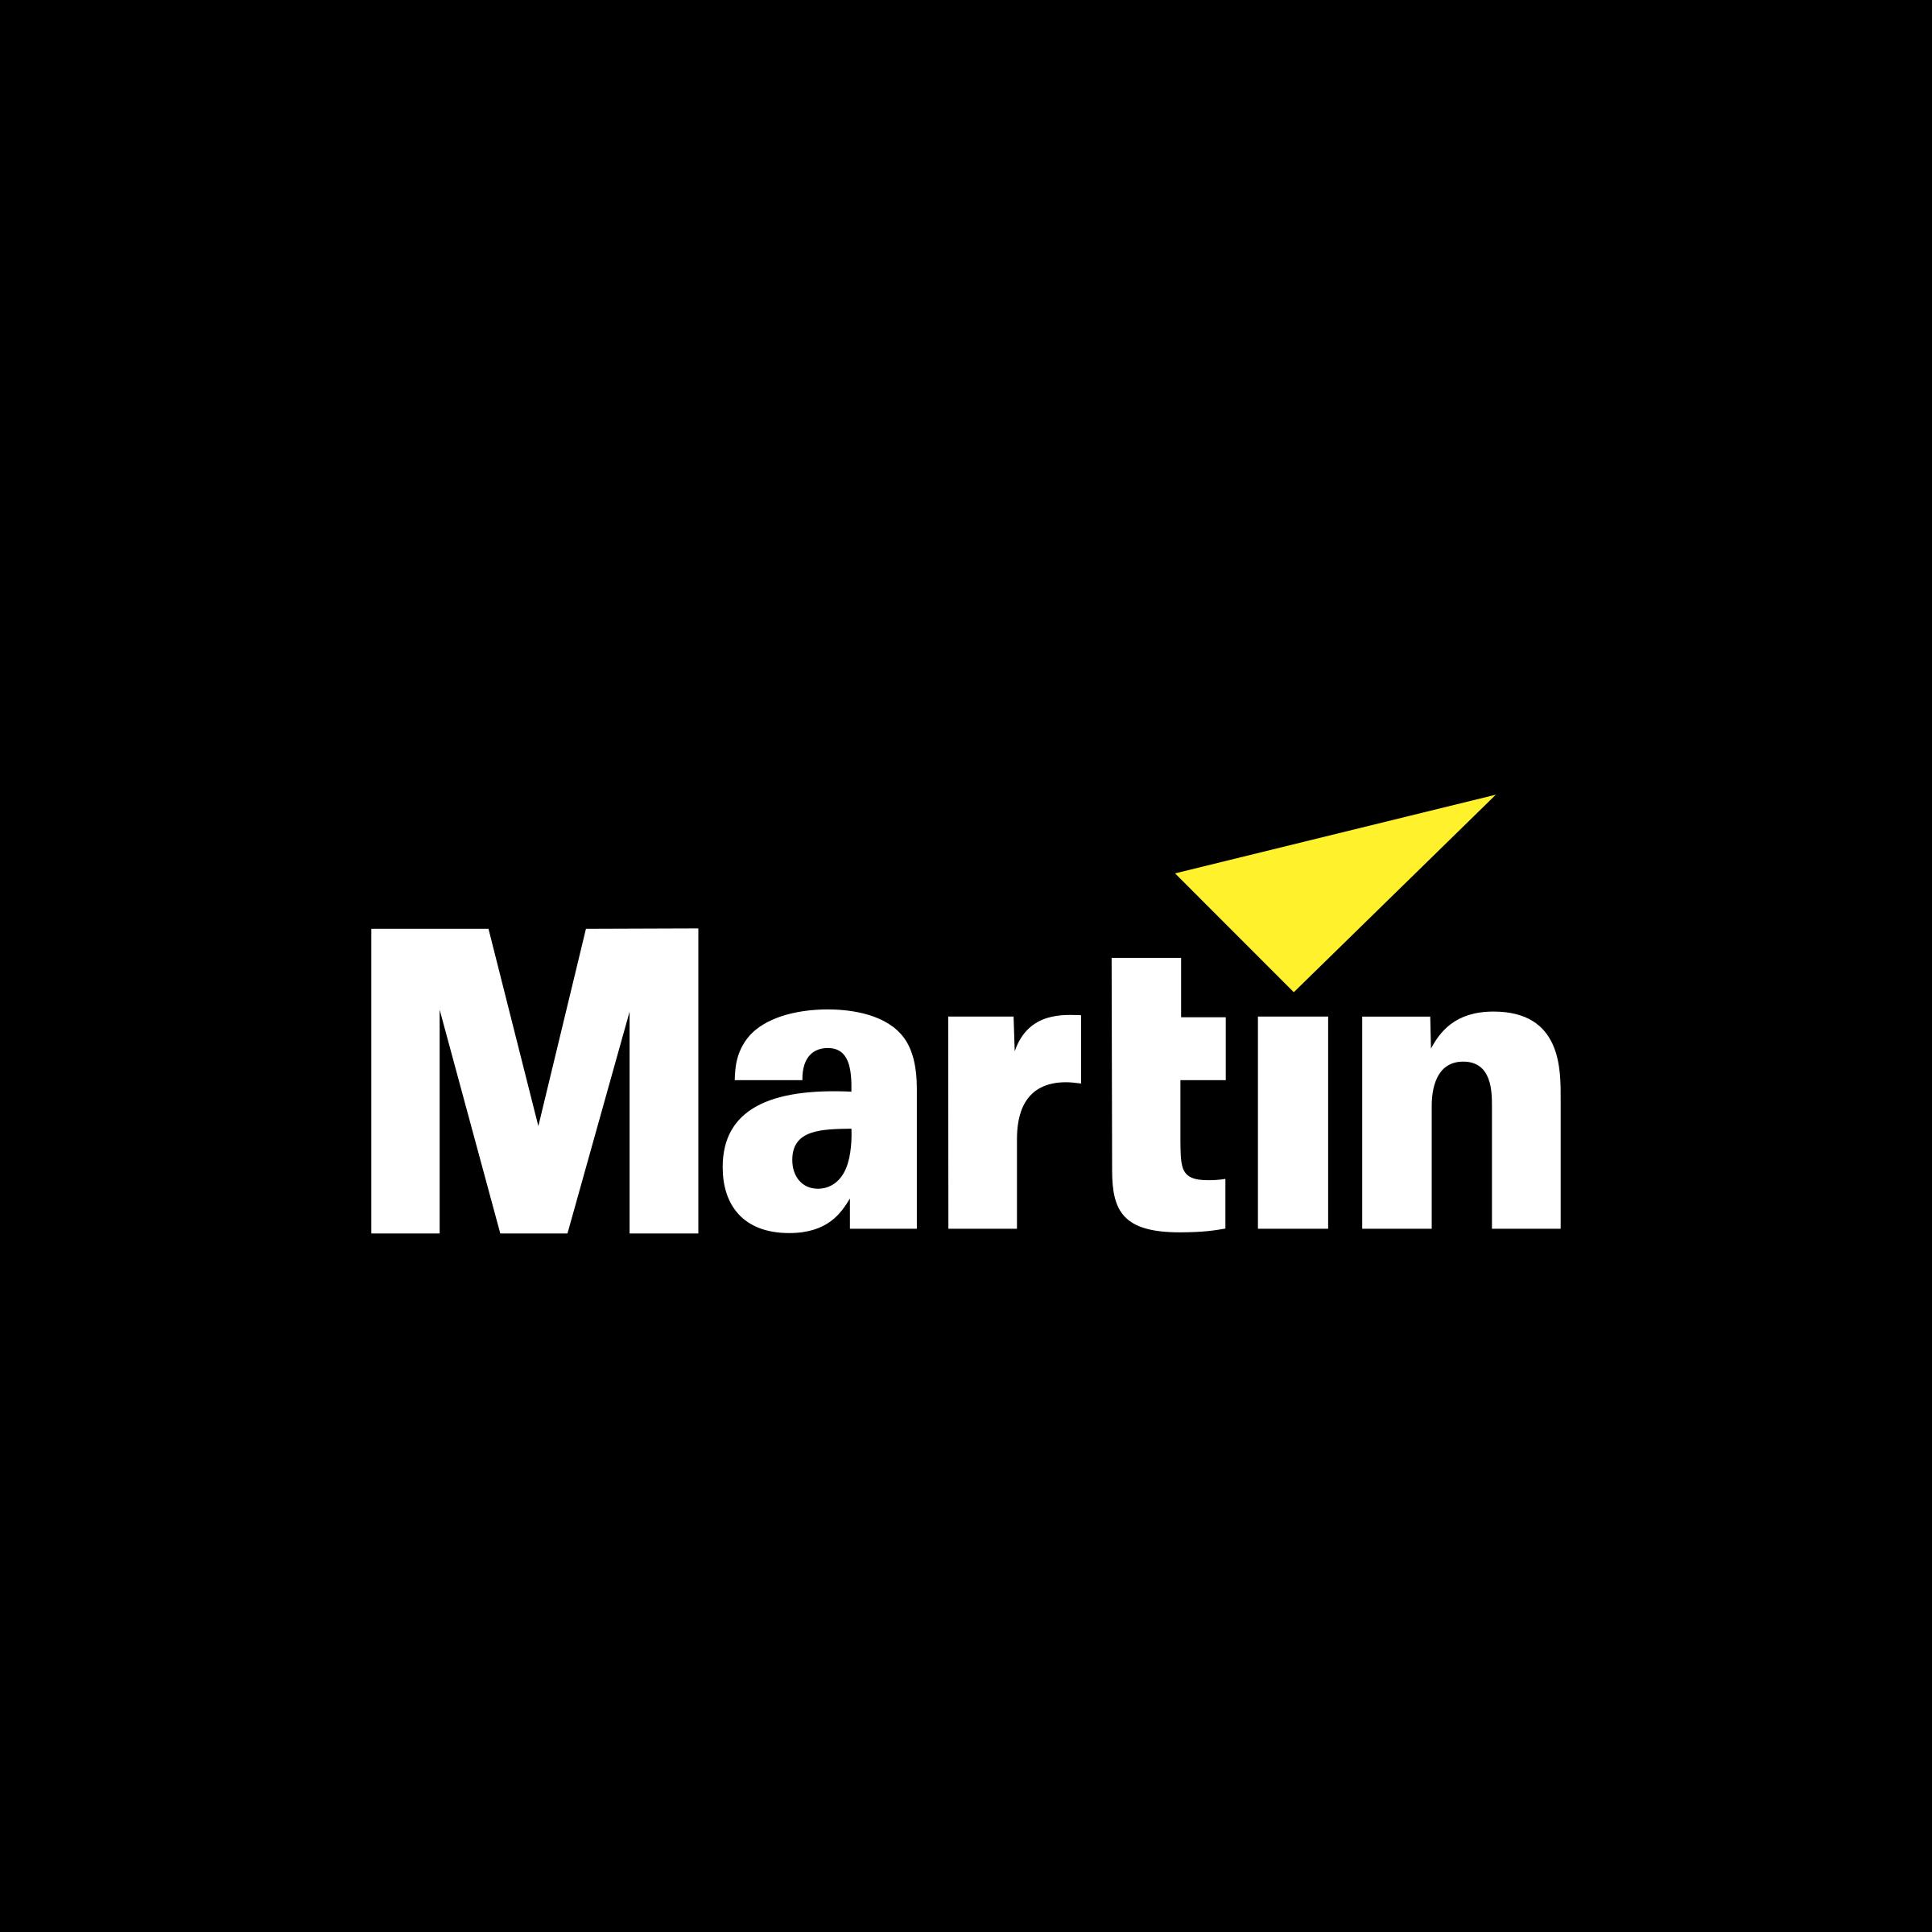 b5a0cb68de2 Martin Logo PNG Transparent   SVG Vector - Freebie Supply